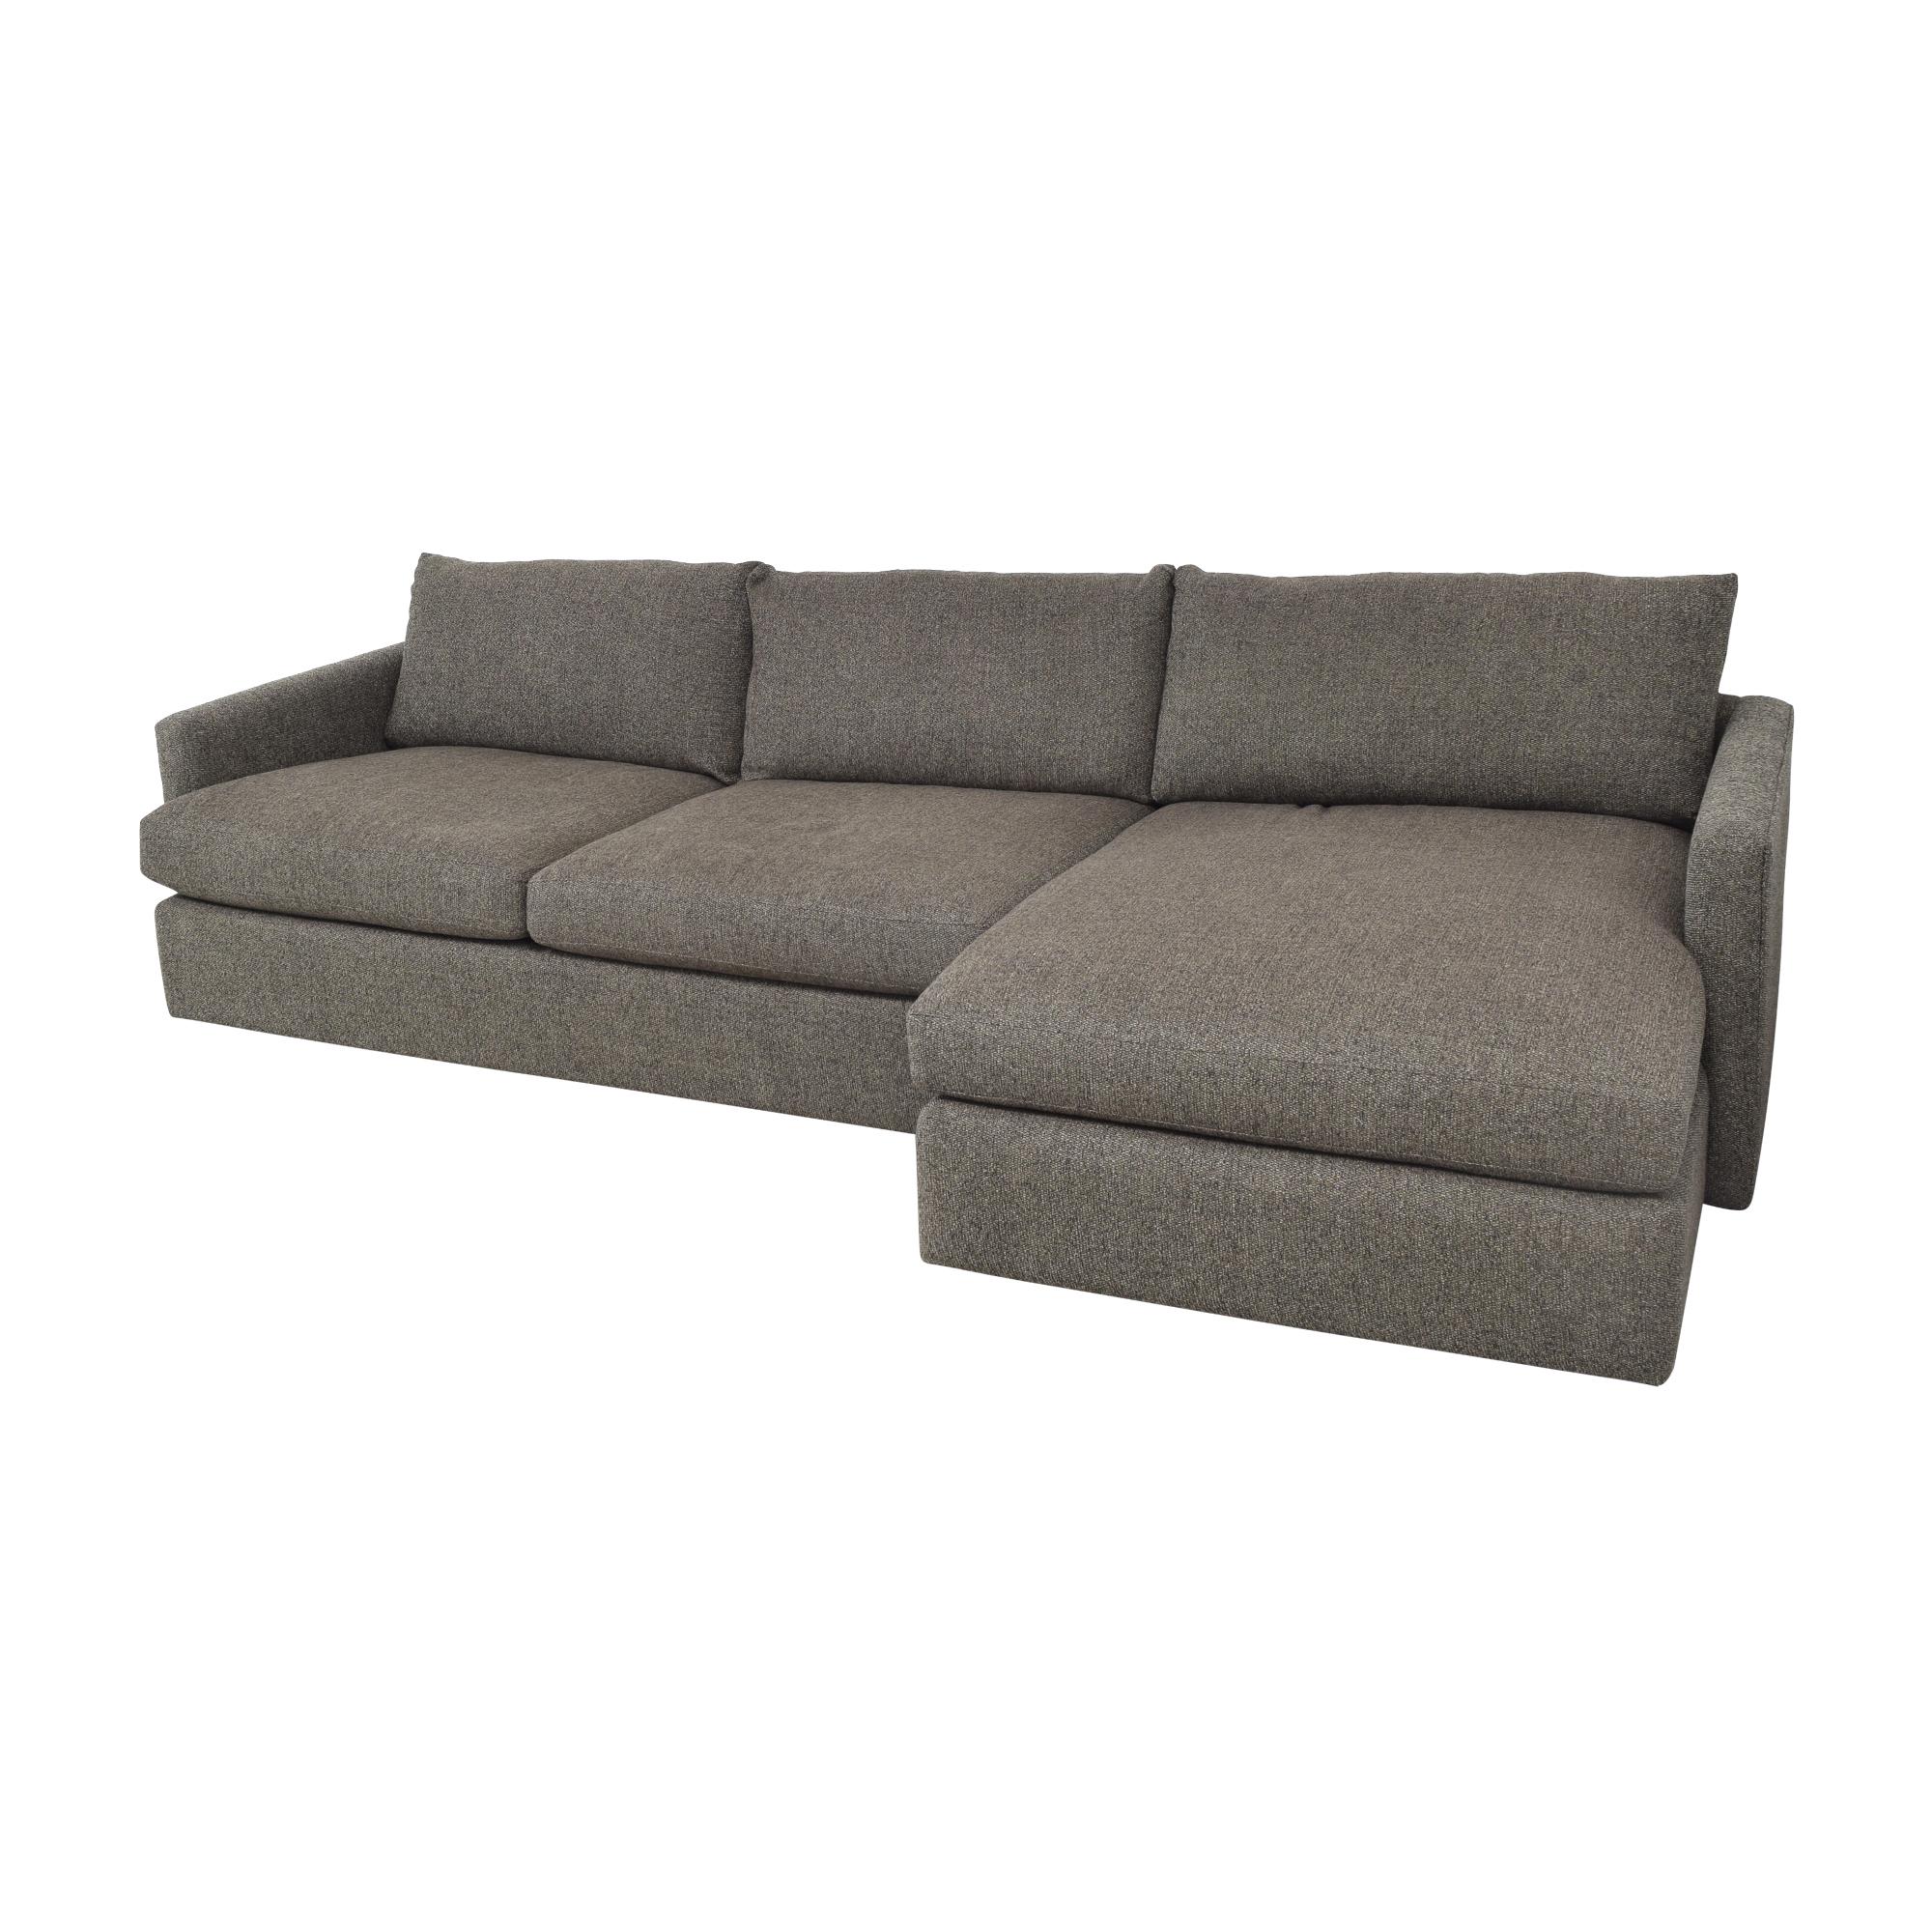 buy Crate & Barrel Crate & Barrel Lounge II 2-Piece Sectional Sofa online